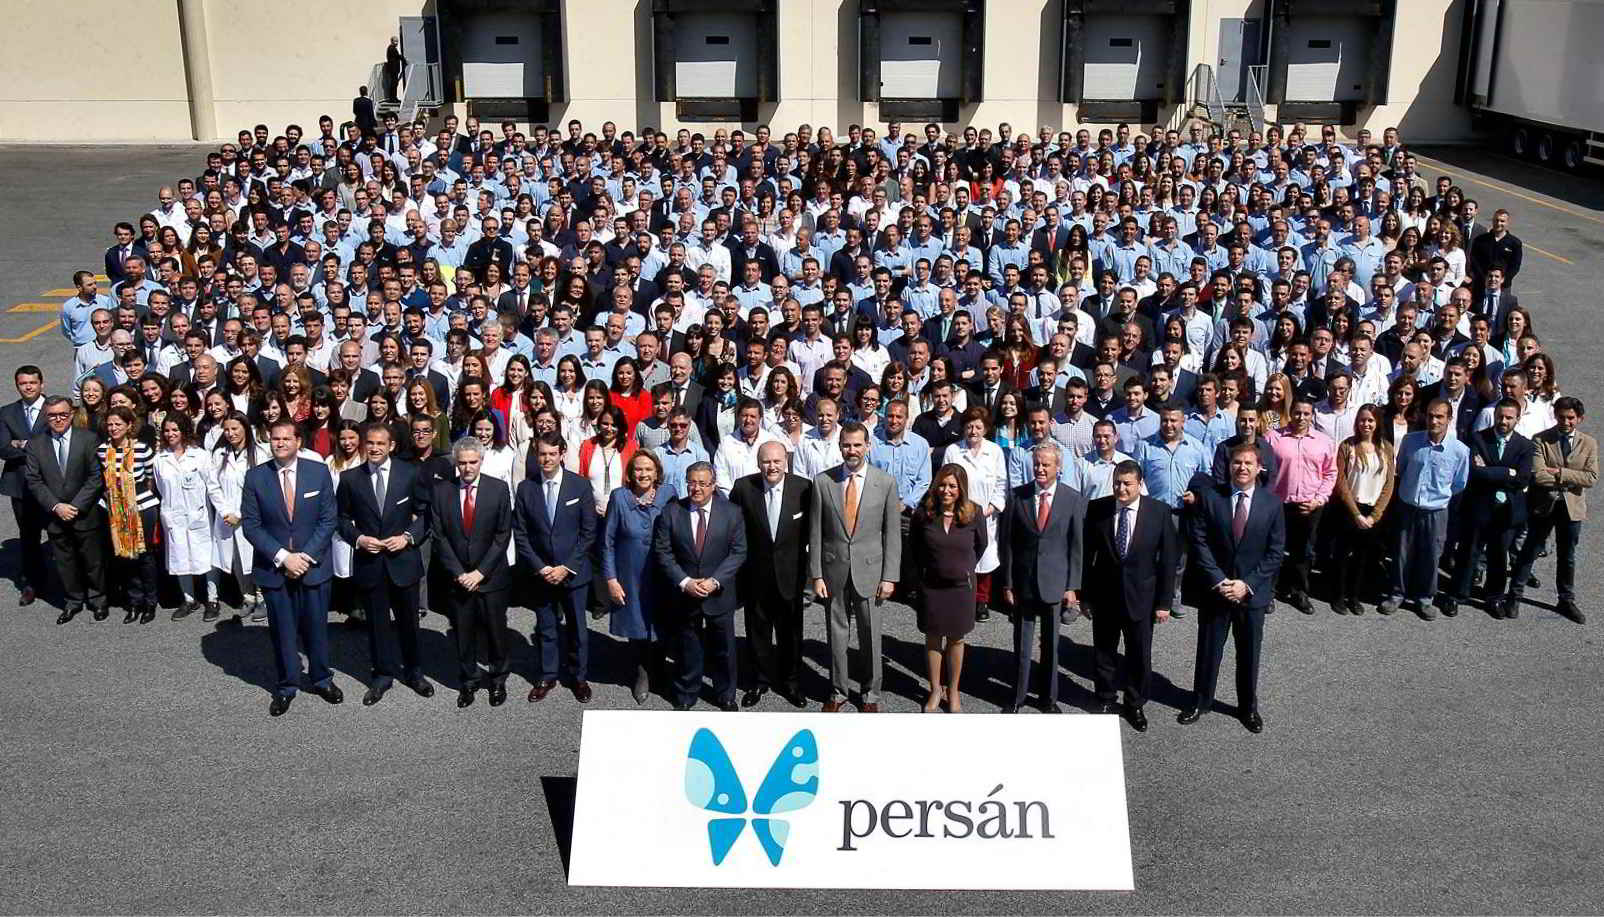 persan-empresa-equipo